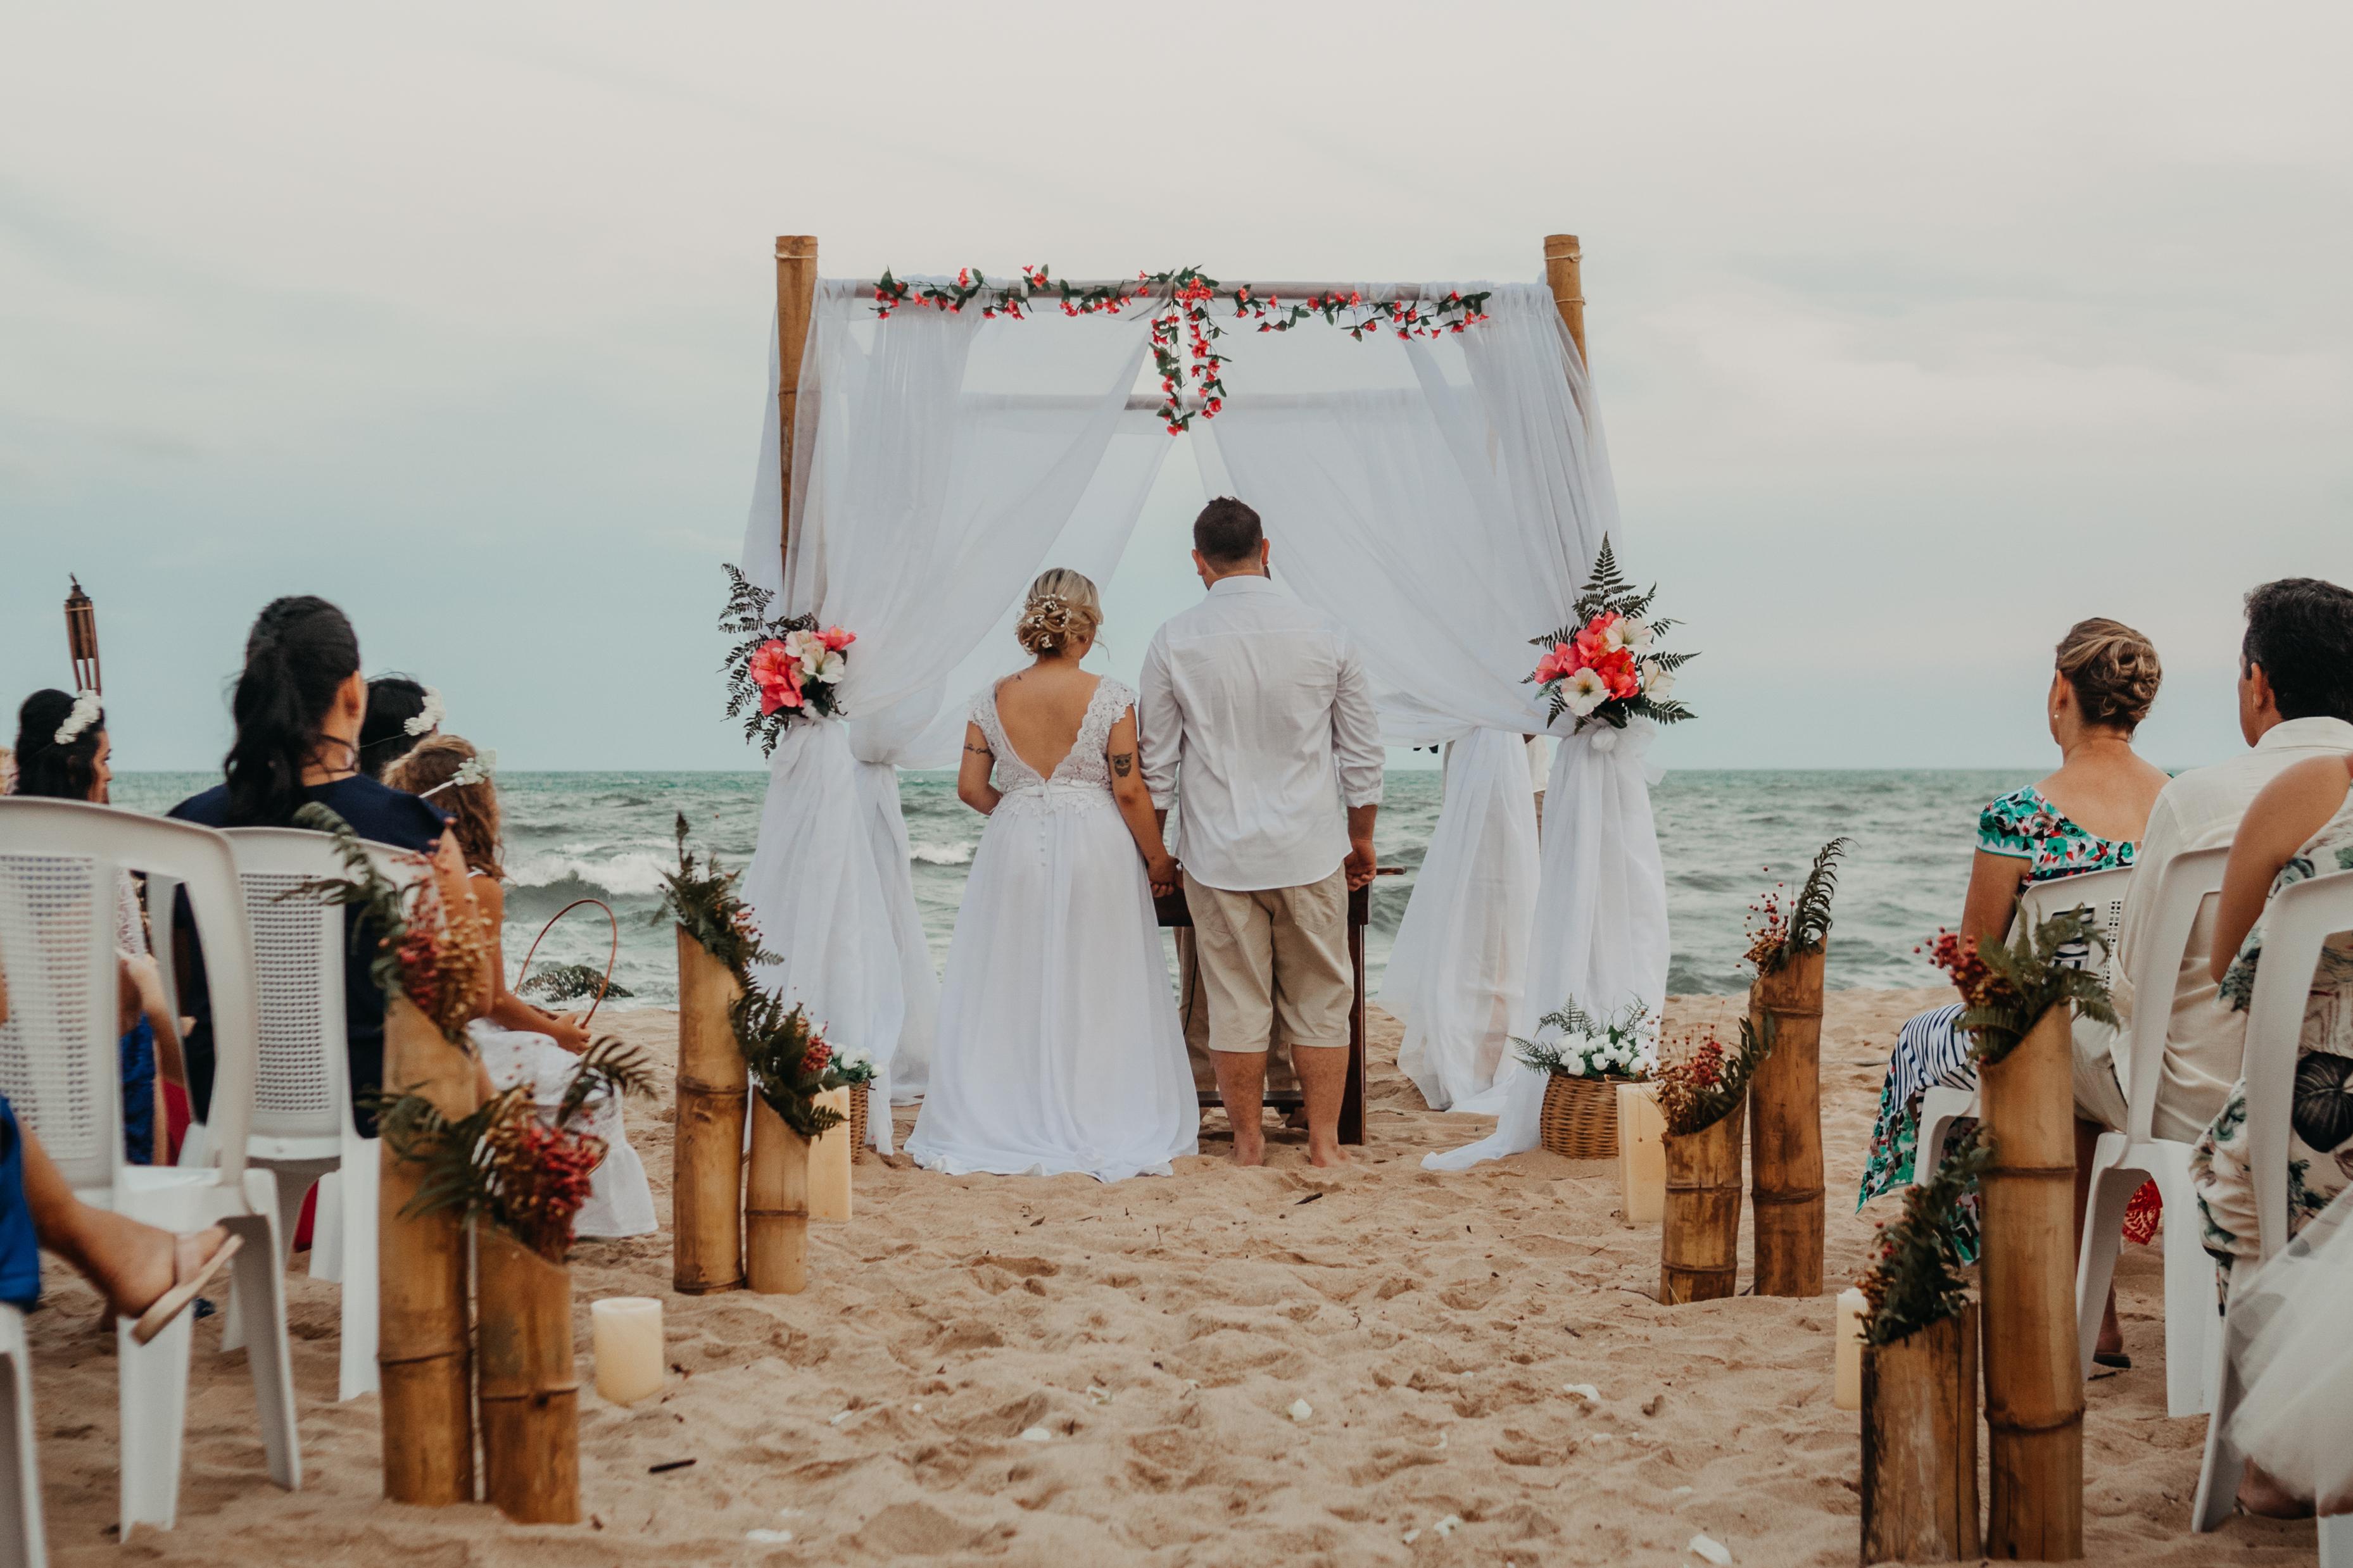 Contate Wedding Photographer in Gold Coast / Austrália - Misso Photography